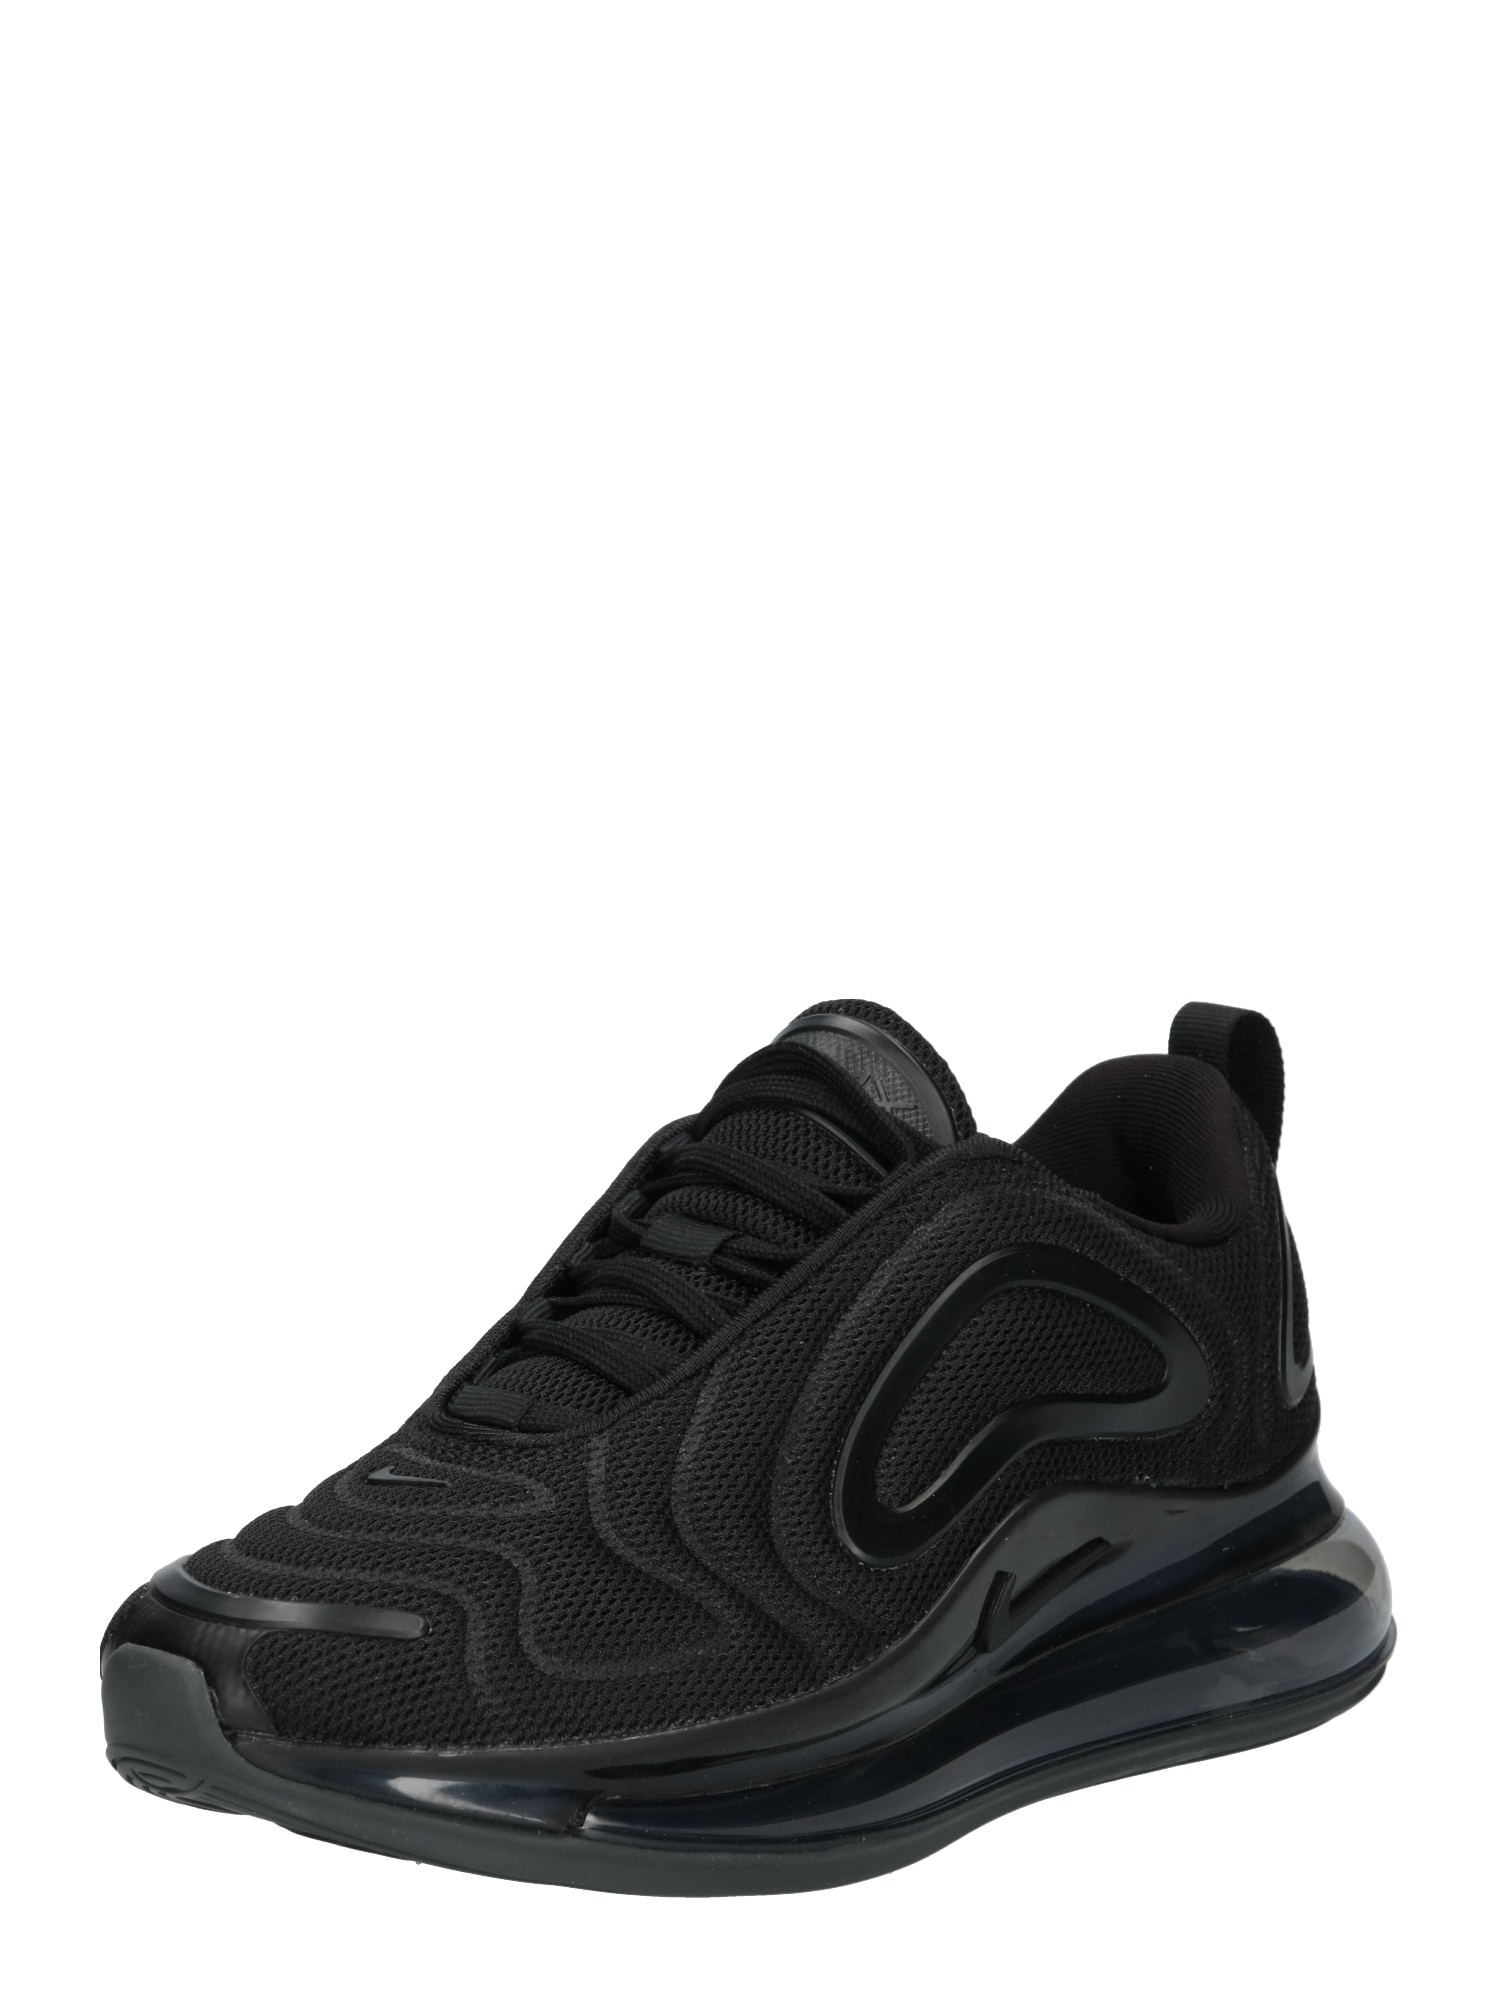 Tenisky Air Max 720 černá Nike Sportswear